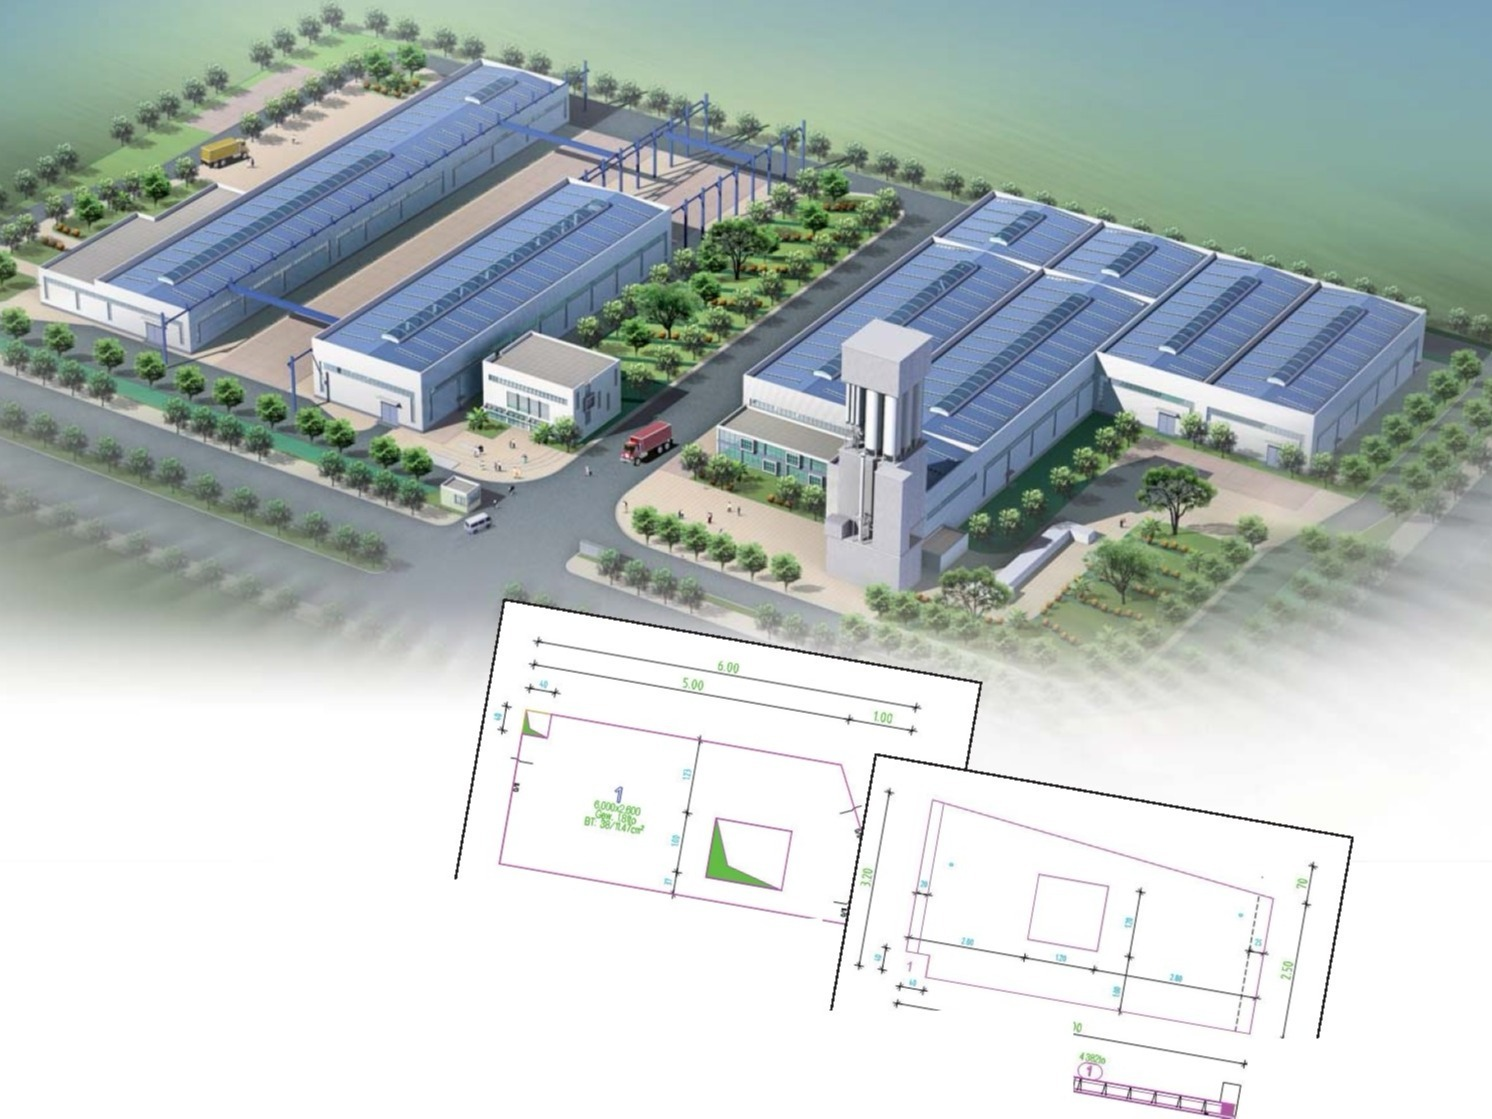 planbar 软件建筑工业化设计